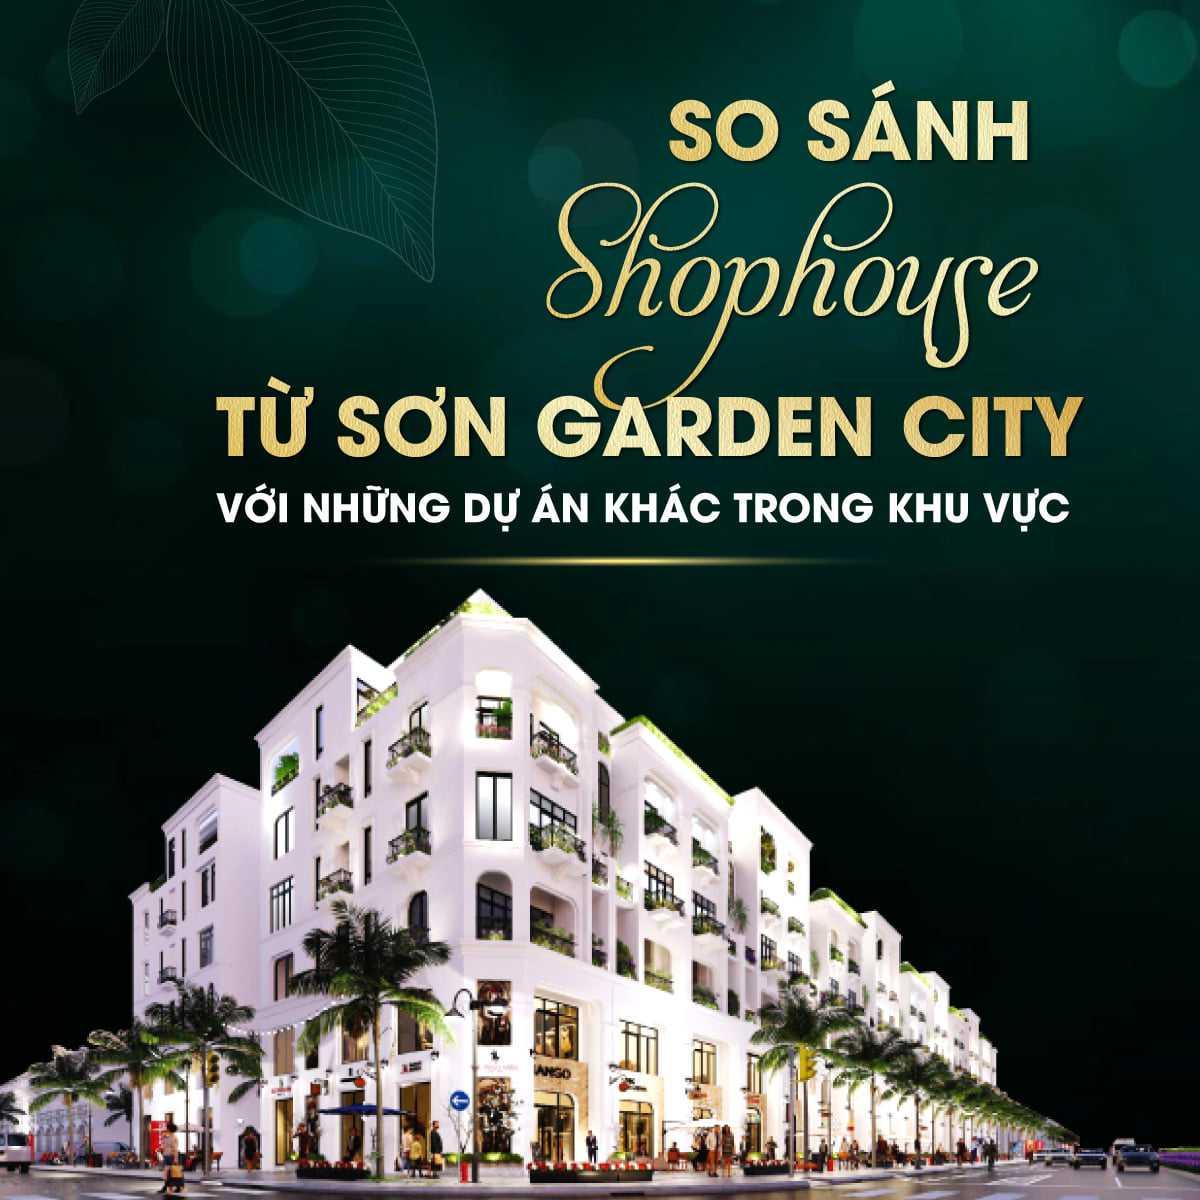 Shophouse từ sơn garden city & các dự án kế cận